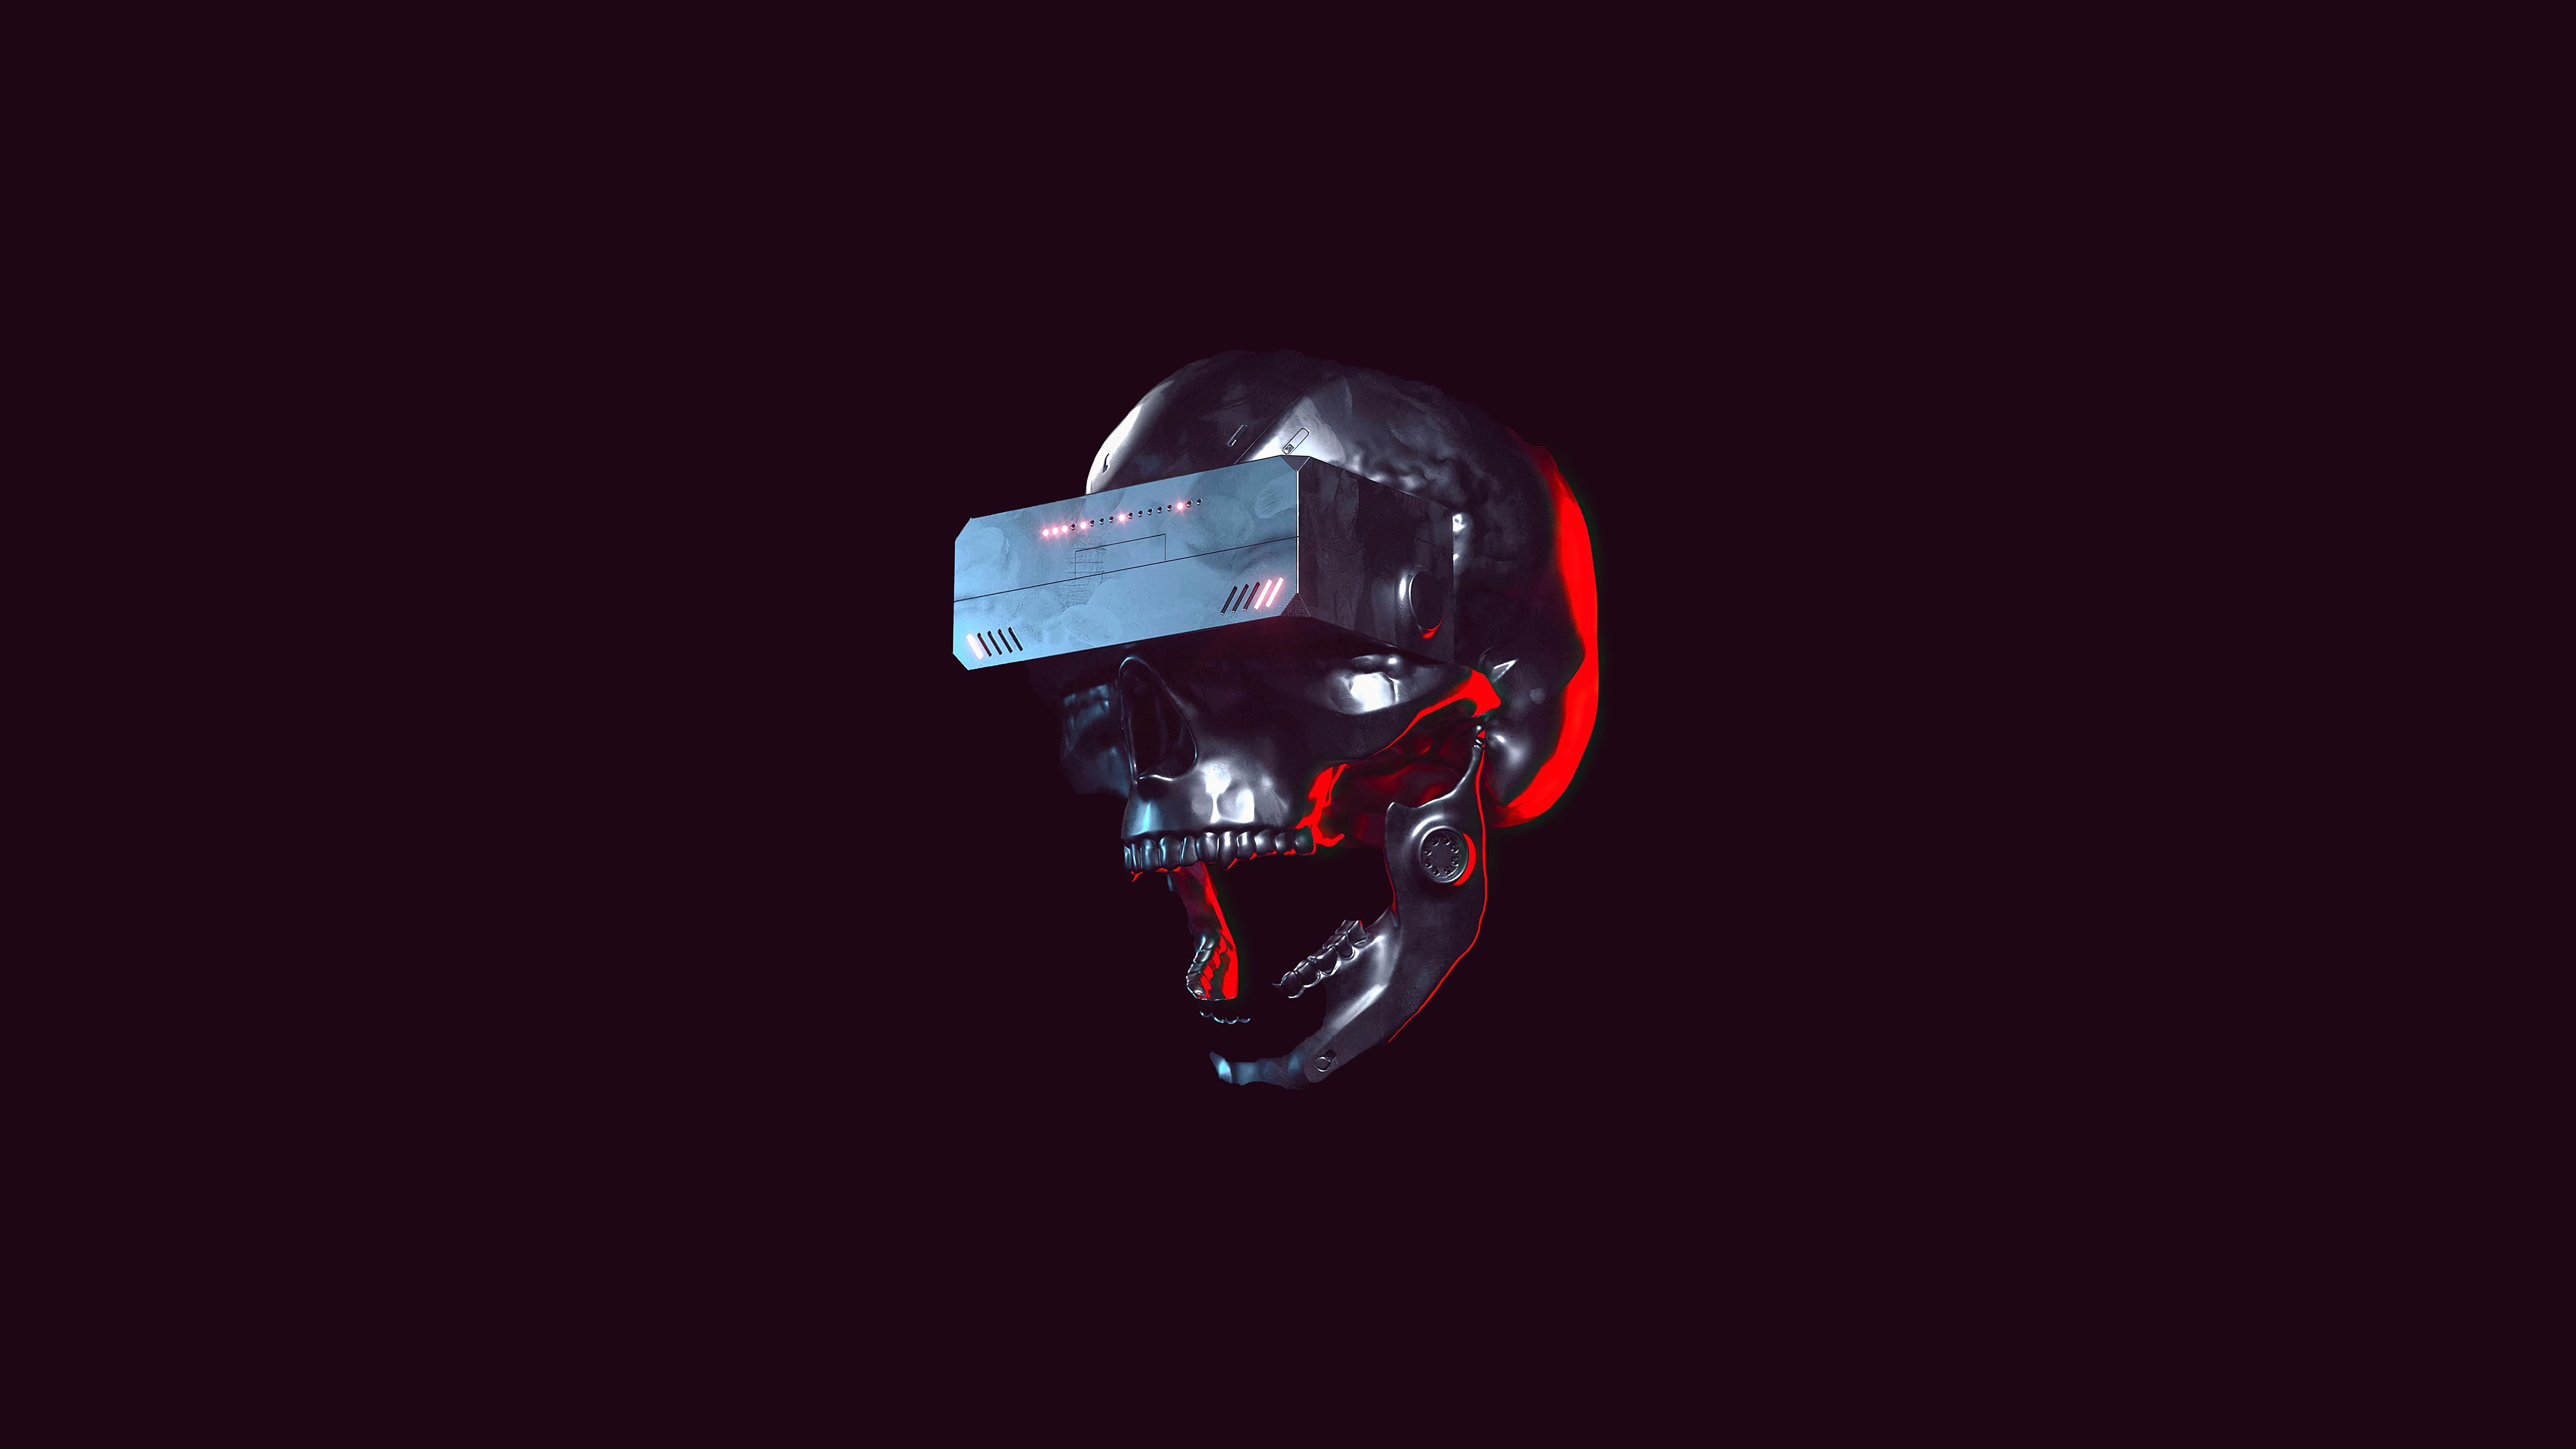 skull scifi future minimal 4k 1618131020 - Skull Scifi Future Minimal 4k - Skull Scifi Future Minimal 4k wallpapers